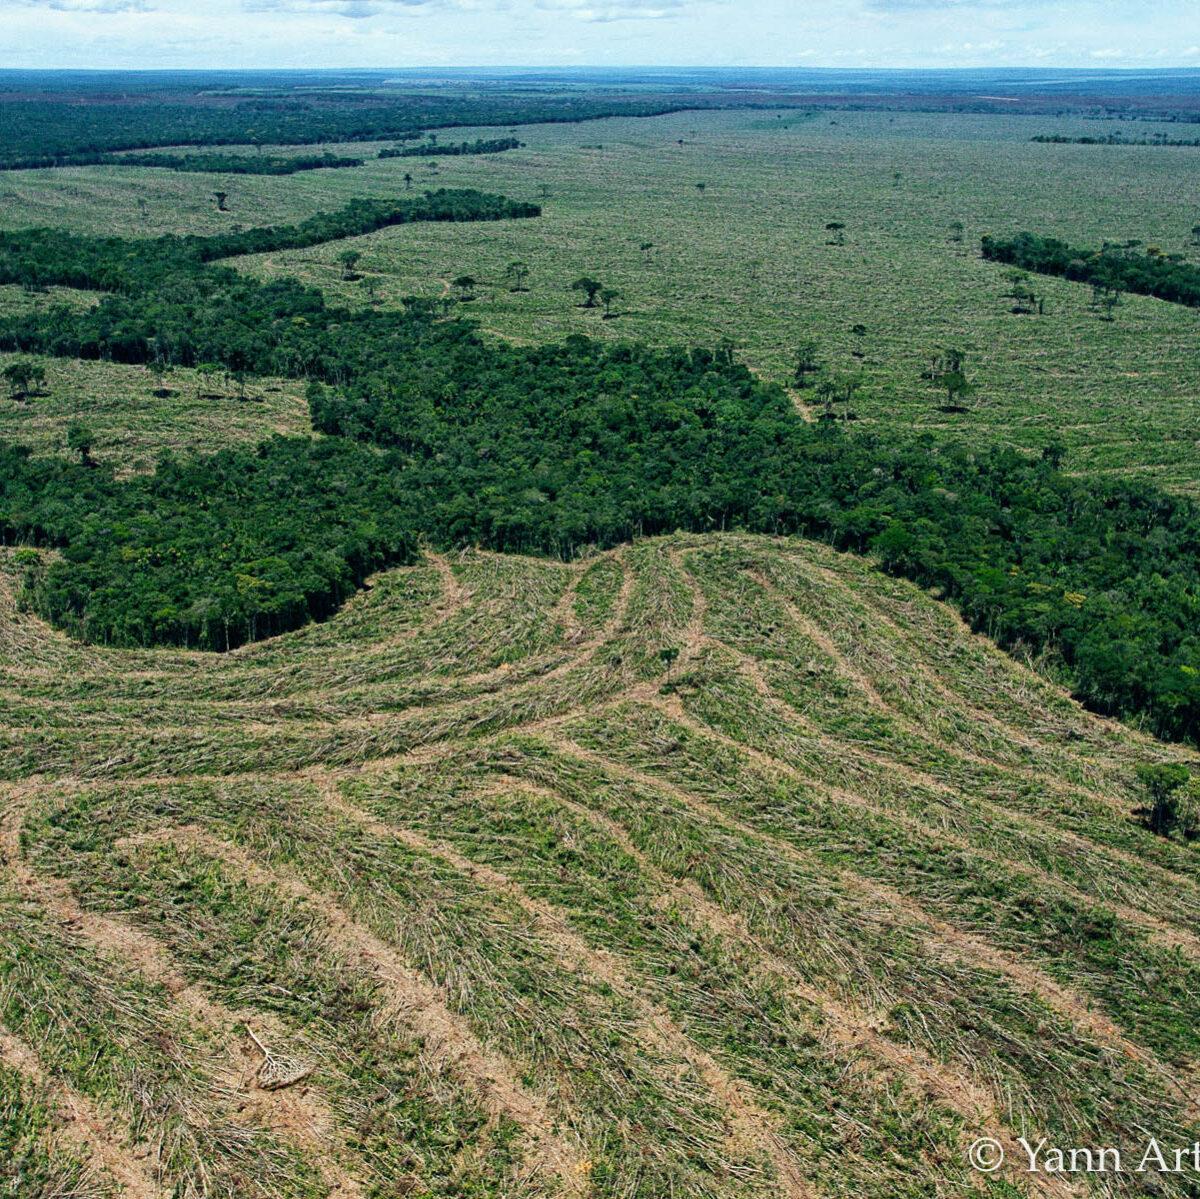 Amazonie déforestation Yann Arthus-Bertrand